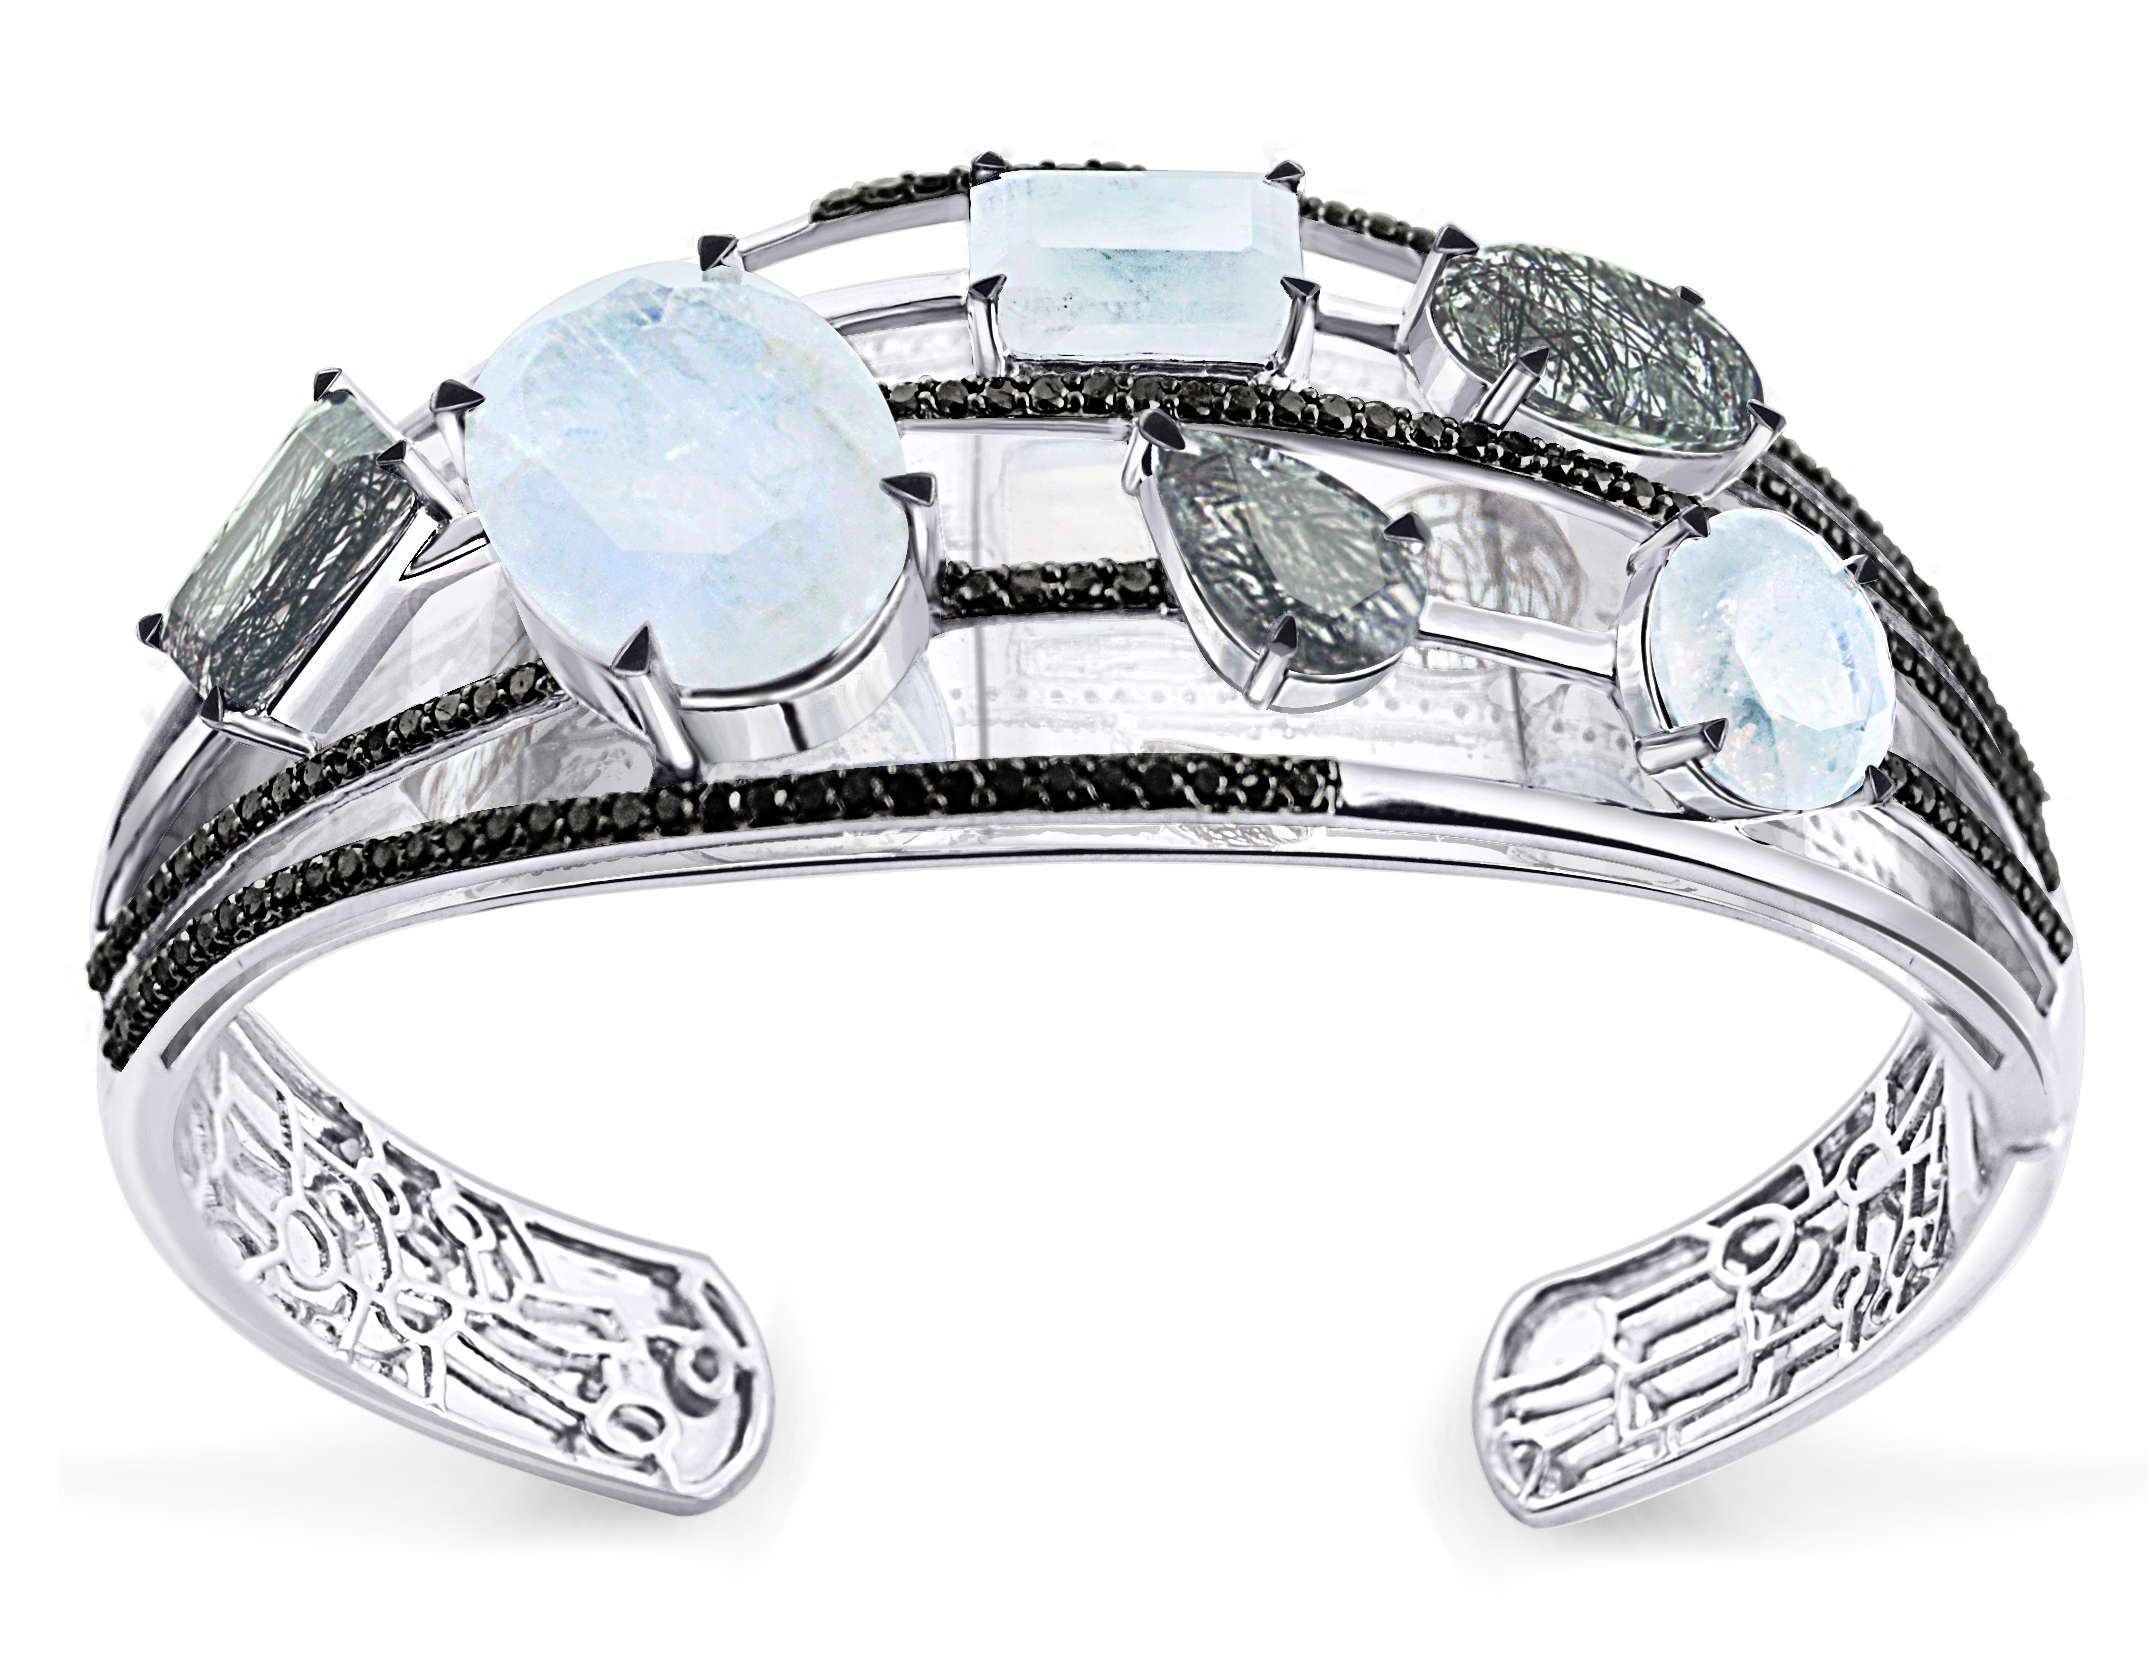 Arya Esha one of a kind cuff bracelet | JCK On Your Market